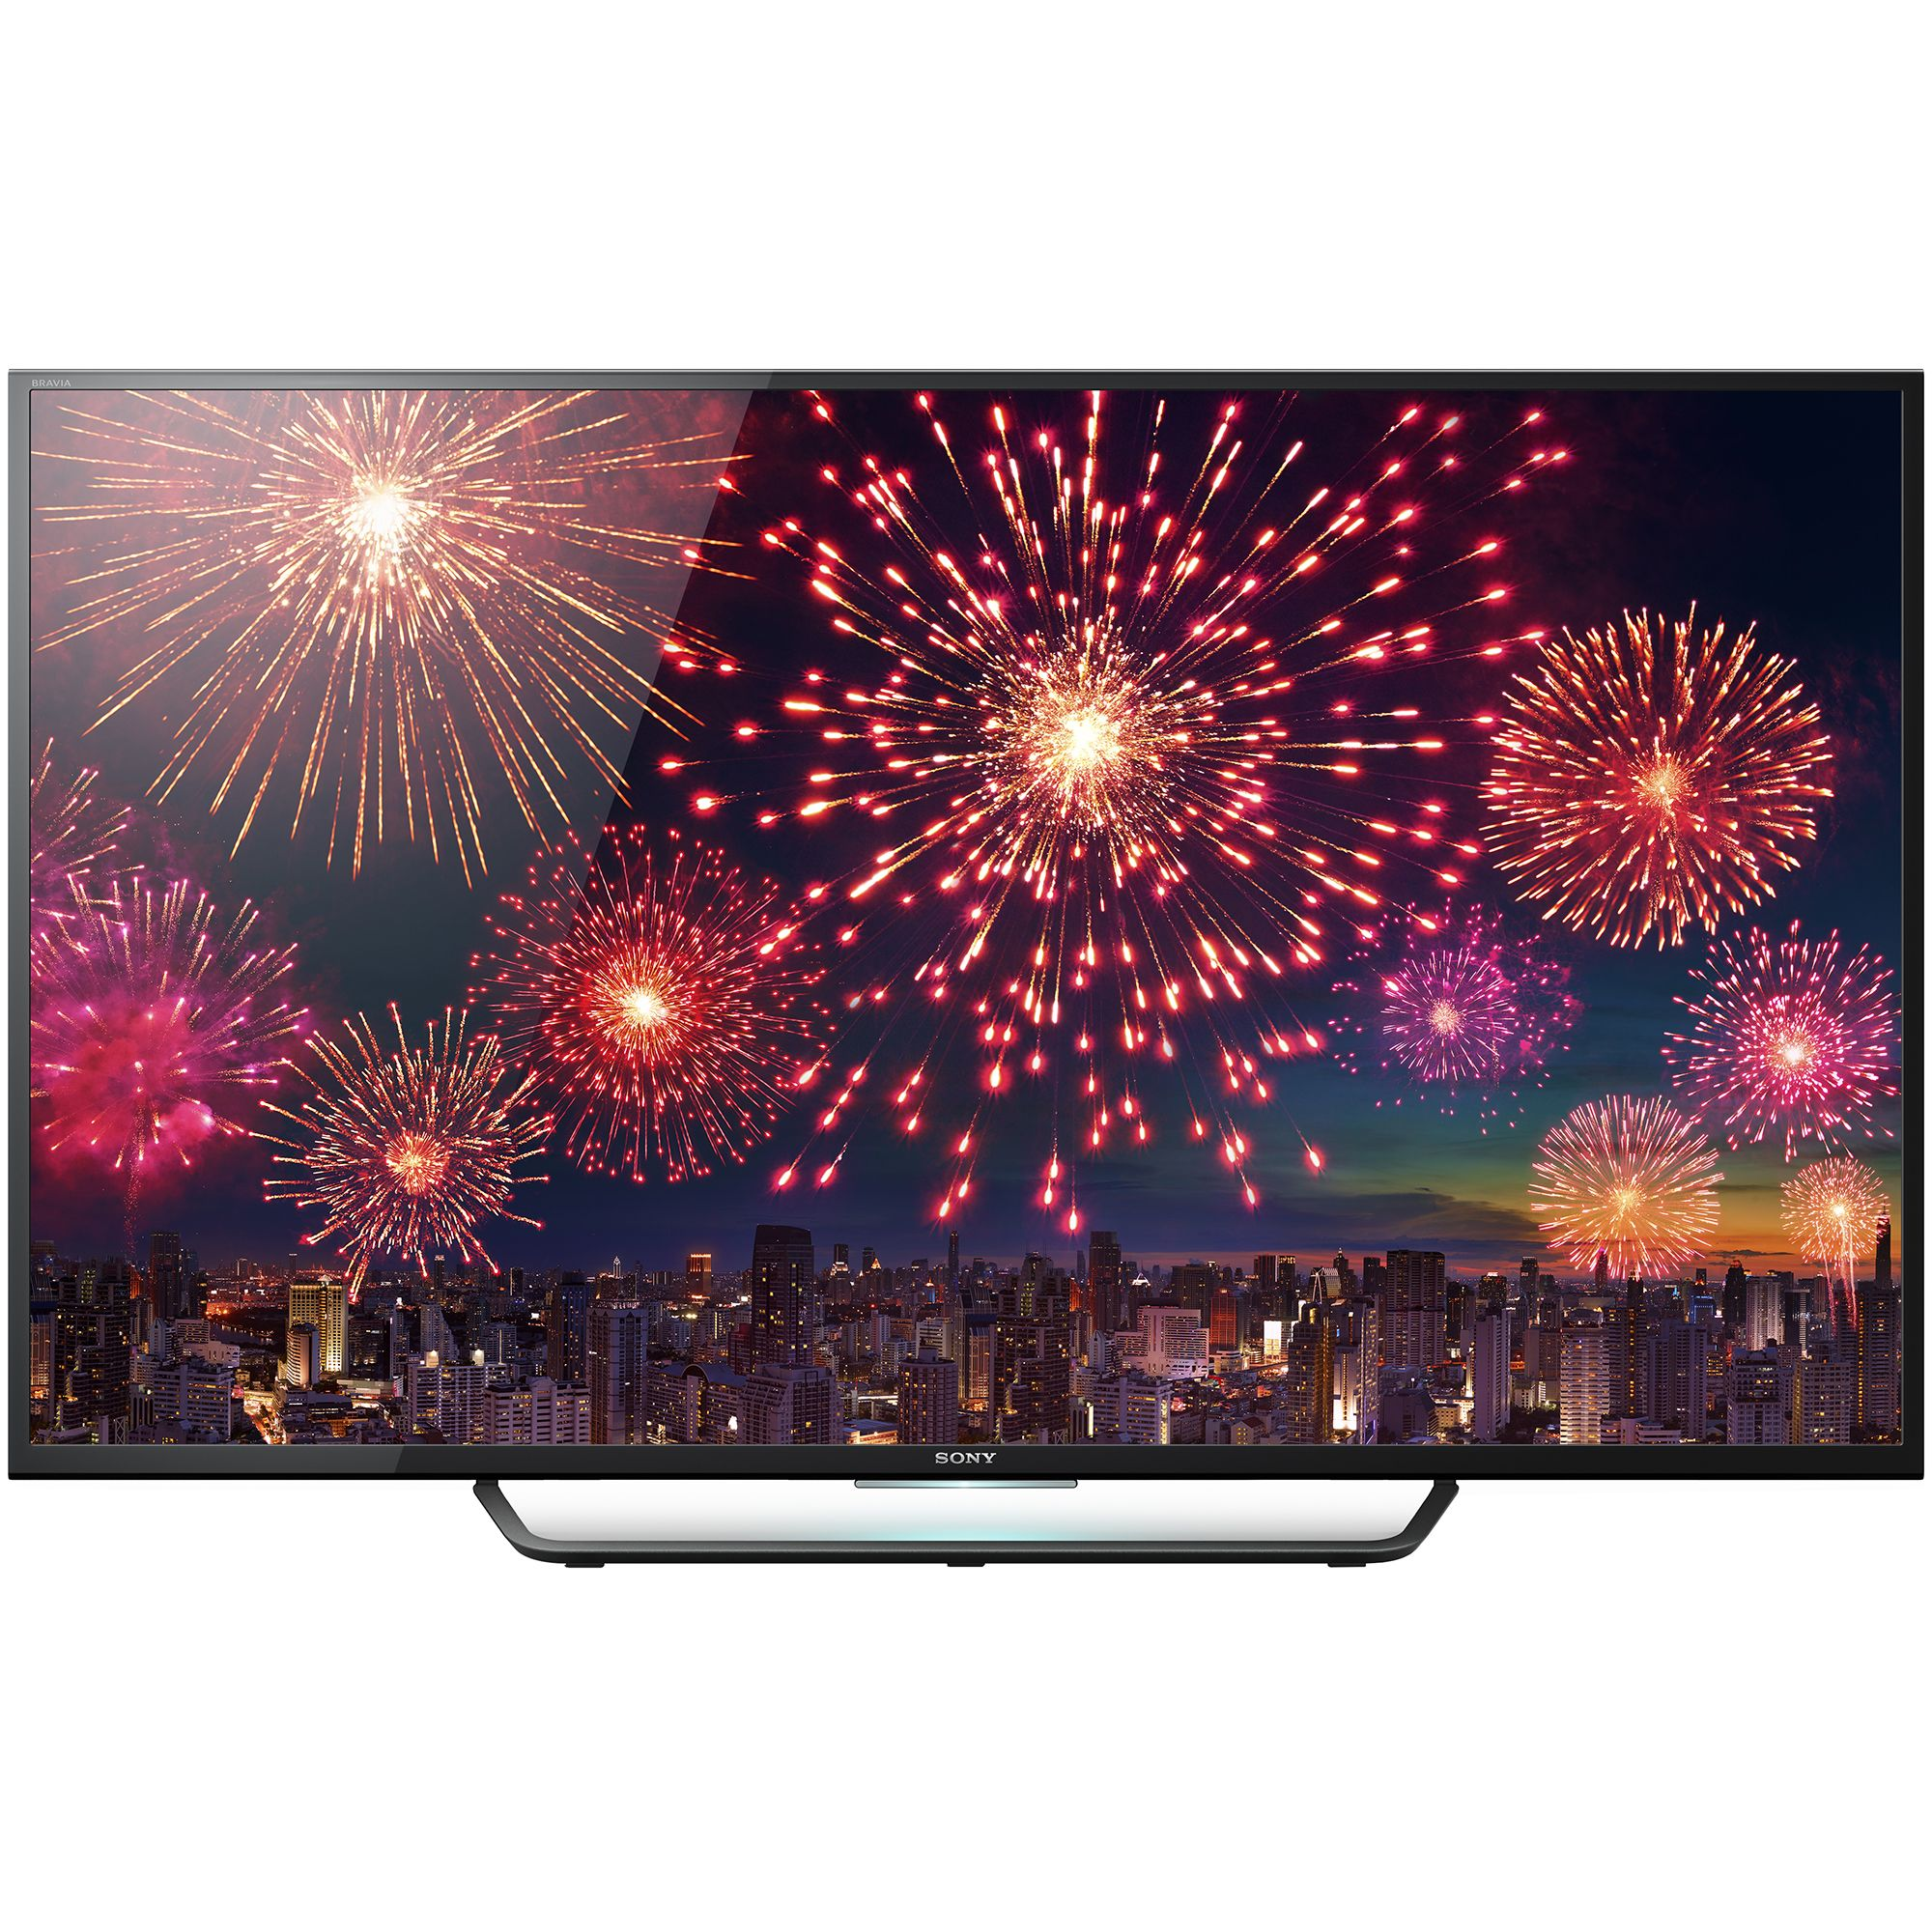 Televizor Led Sony Bravia Kd-49 X8005c 49 4k Uhd 4k Smarttv  800hz  Dvb-t/s2/c  Ci+  Wifi  Negru